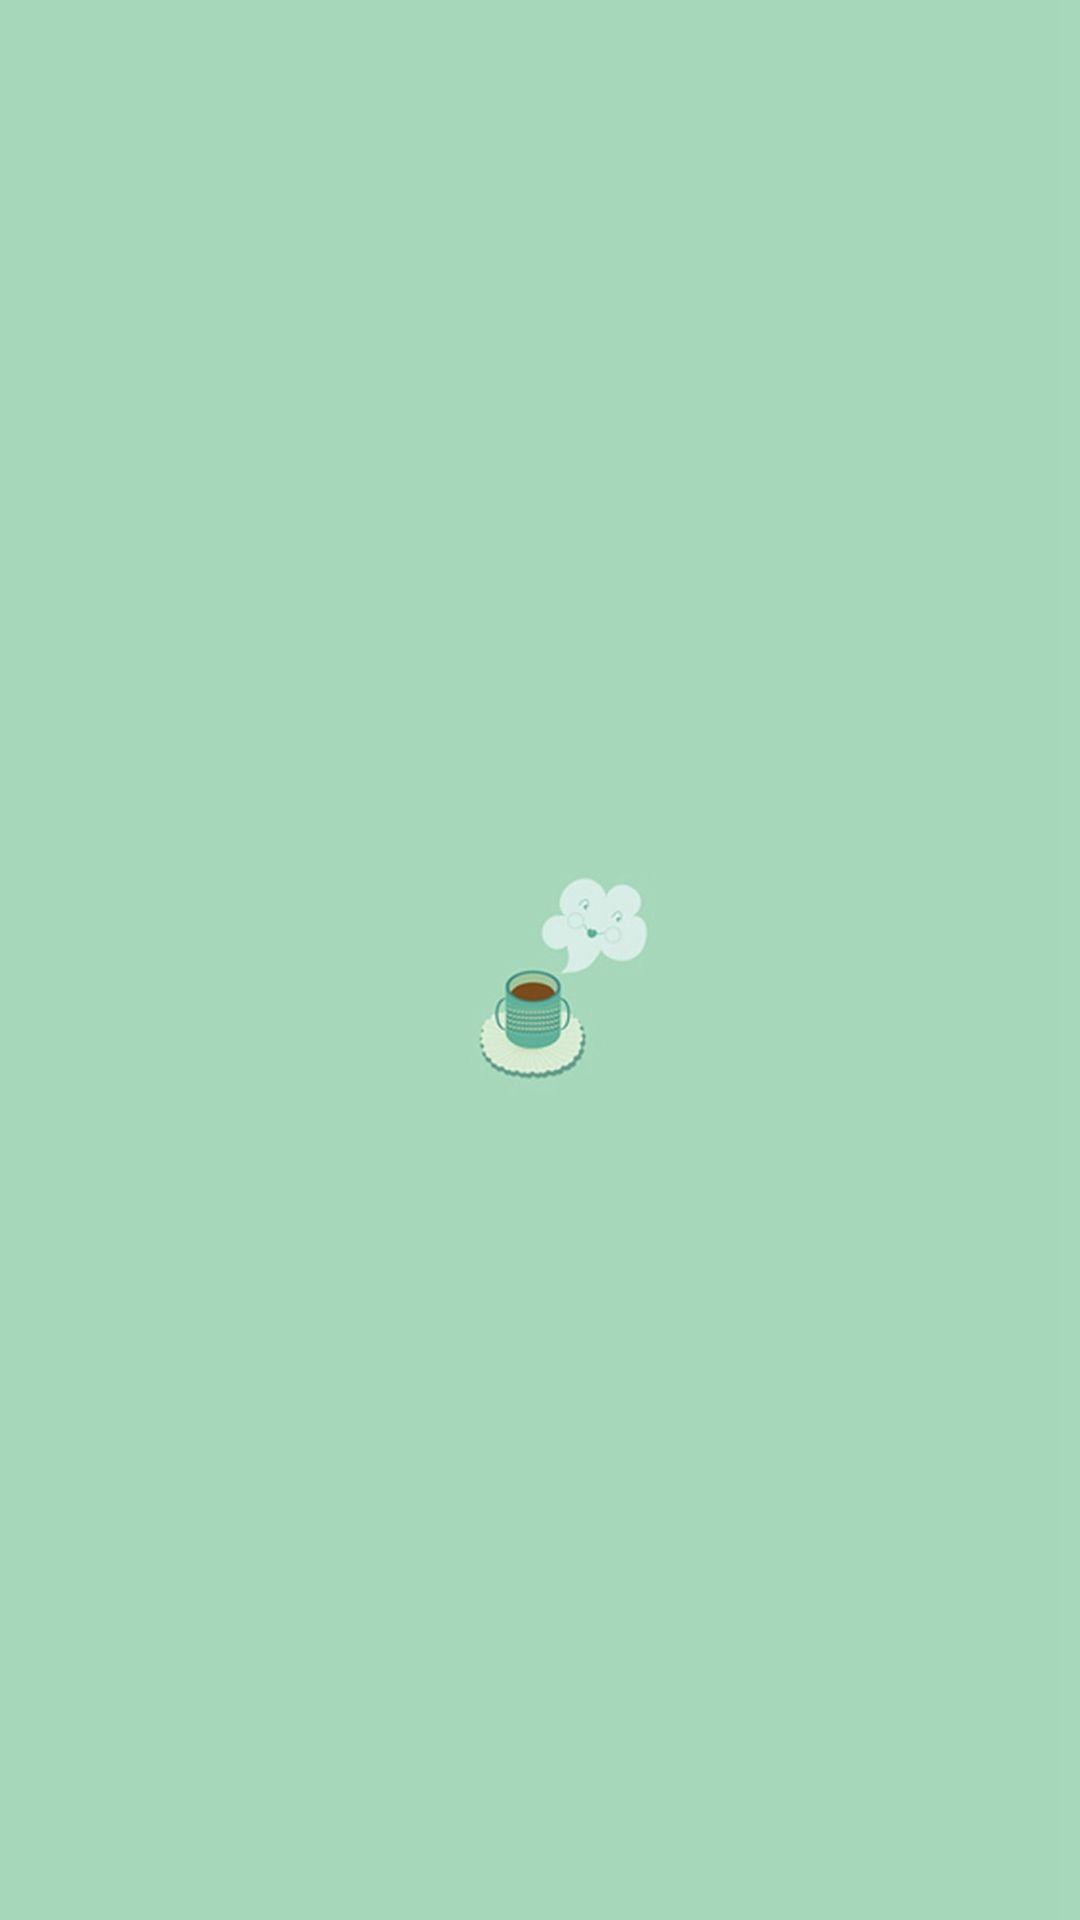 Simple Coffee Mug Flat Illustration Iphone 6 Wallpaper Download Iphone Wallpapers Ipad Coffee Wallpaper Iphone Simple Iphone Wallpaper Minimalist Wallpaper